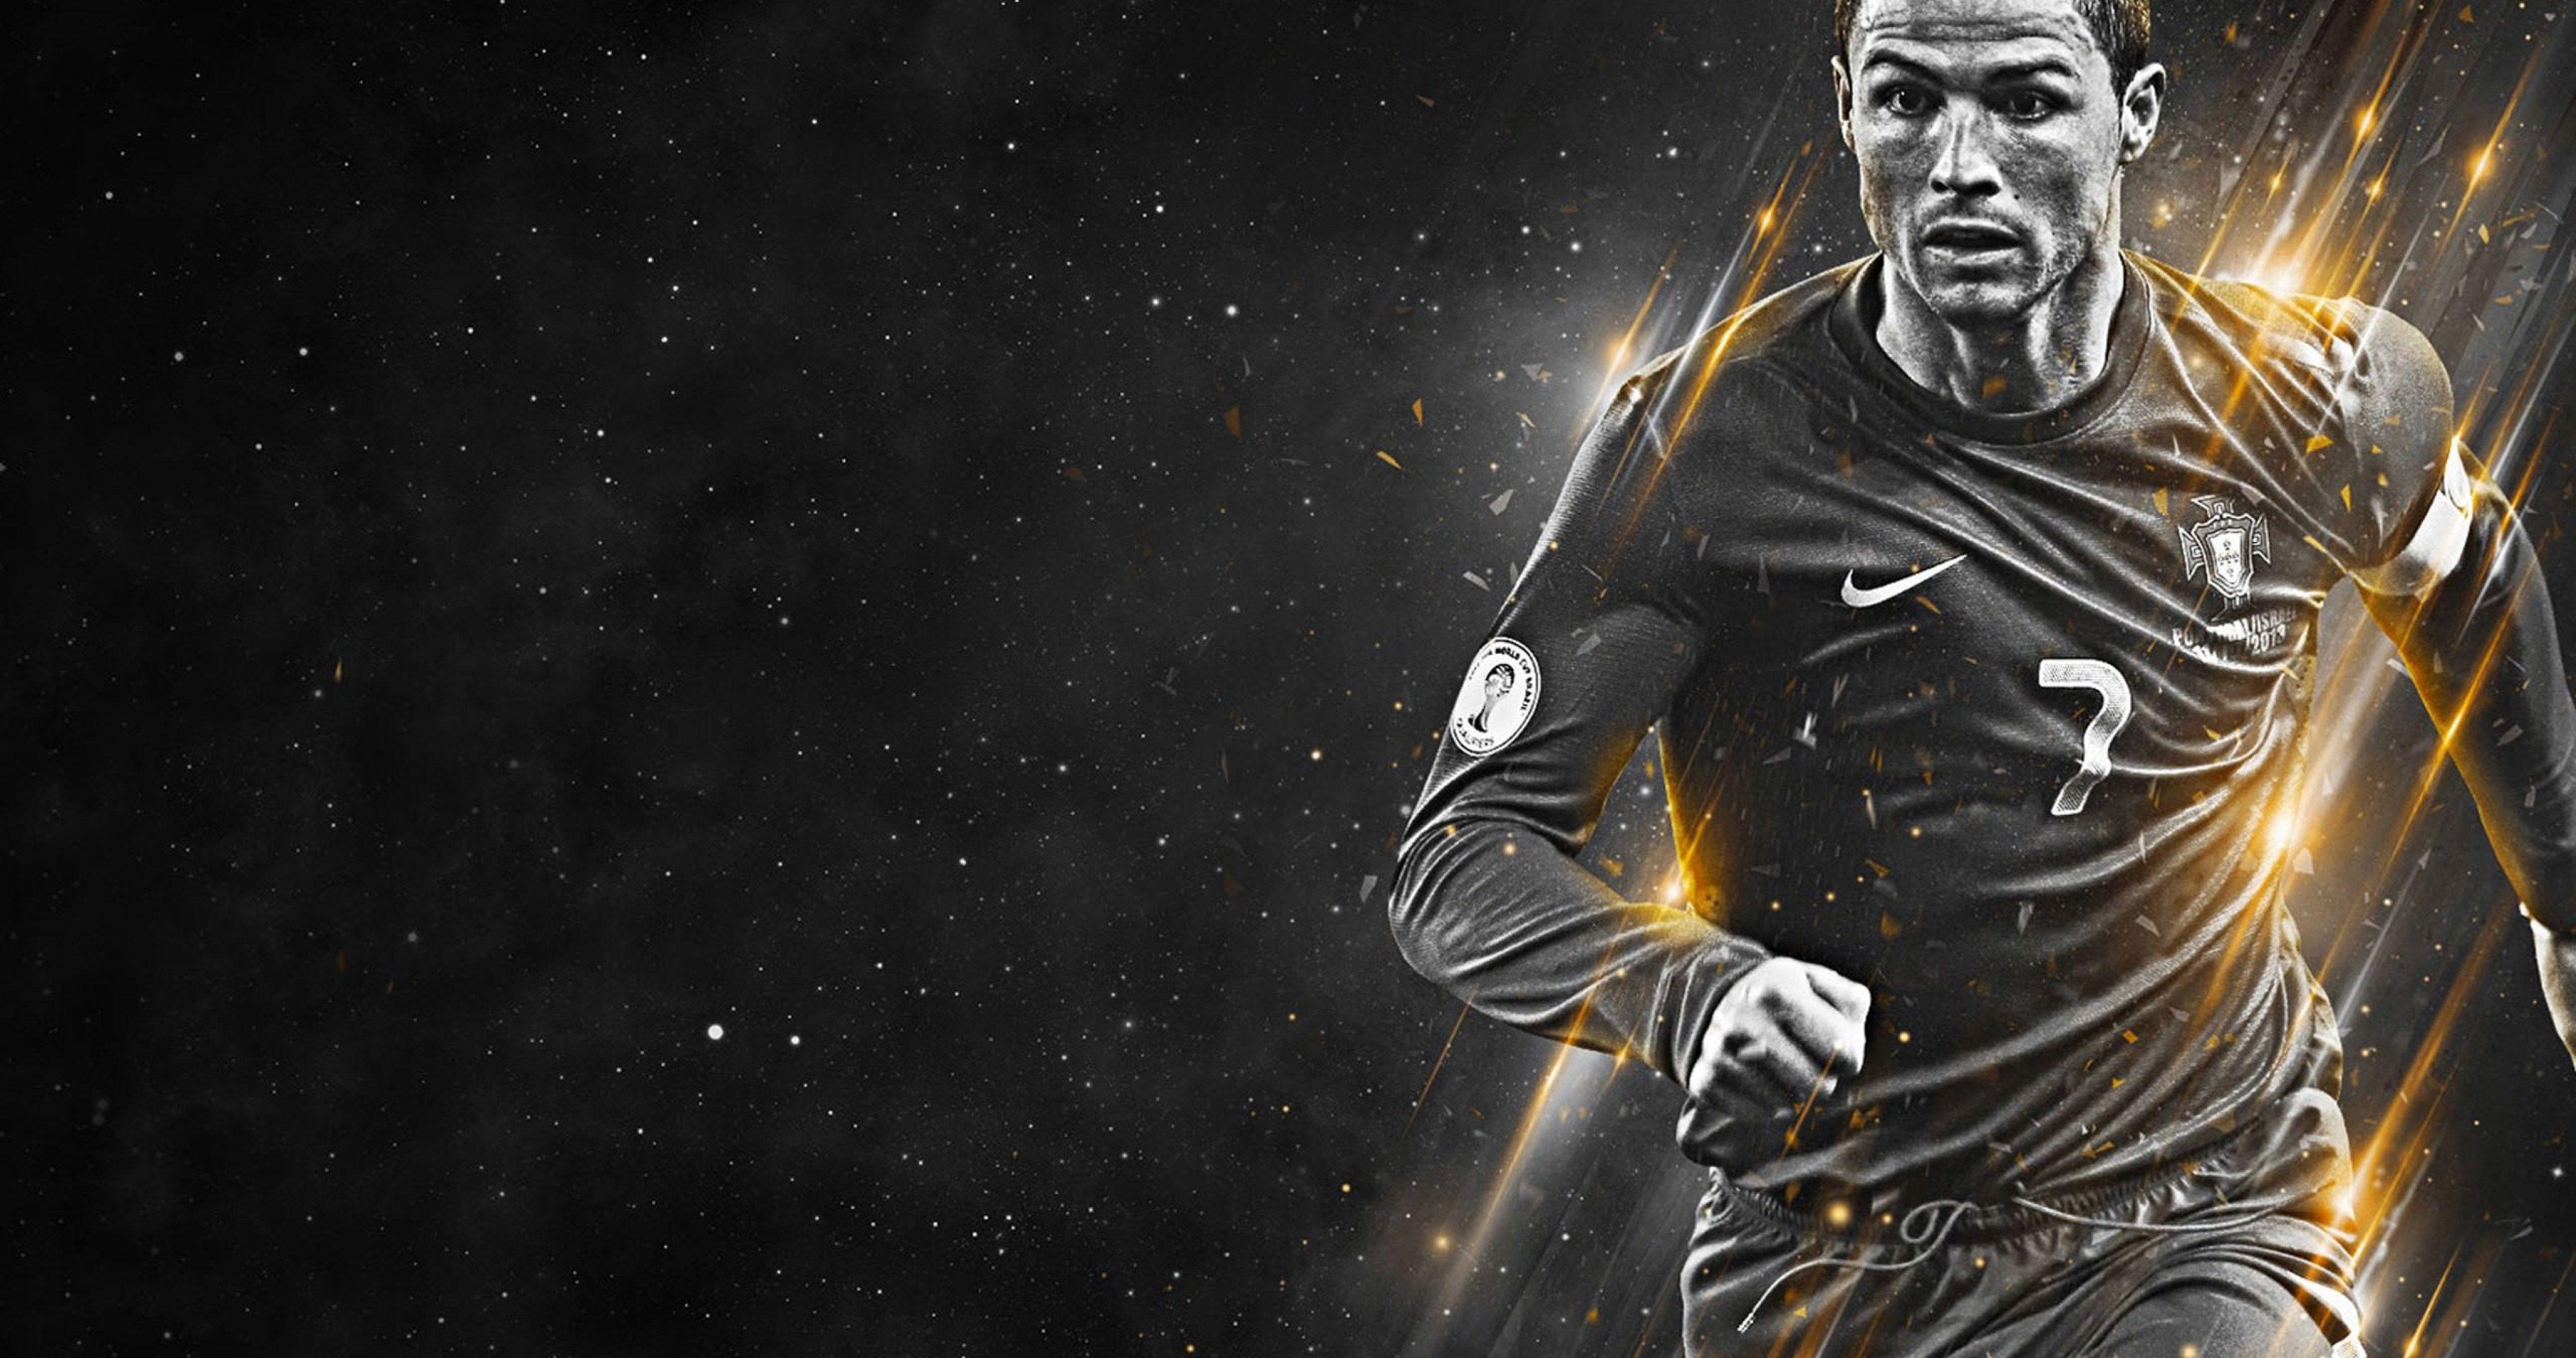 Ronaldo Cristiano 2015 4k Ultra Hd Wallpaper Cristiano Ronaldo Wallpapers Ronaldo Wallpapers Ronaldo Football Player